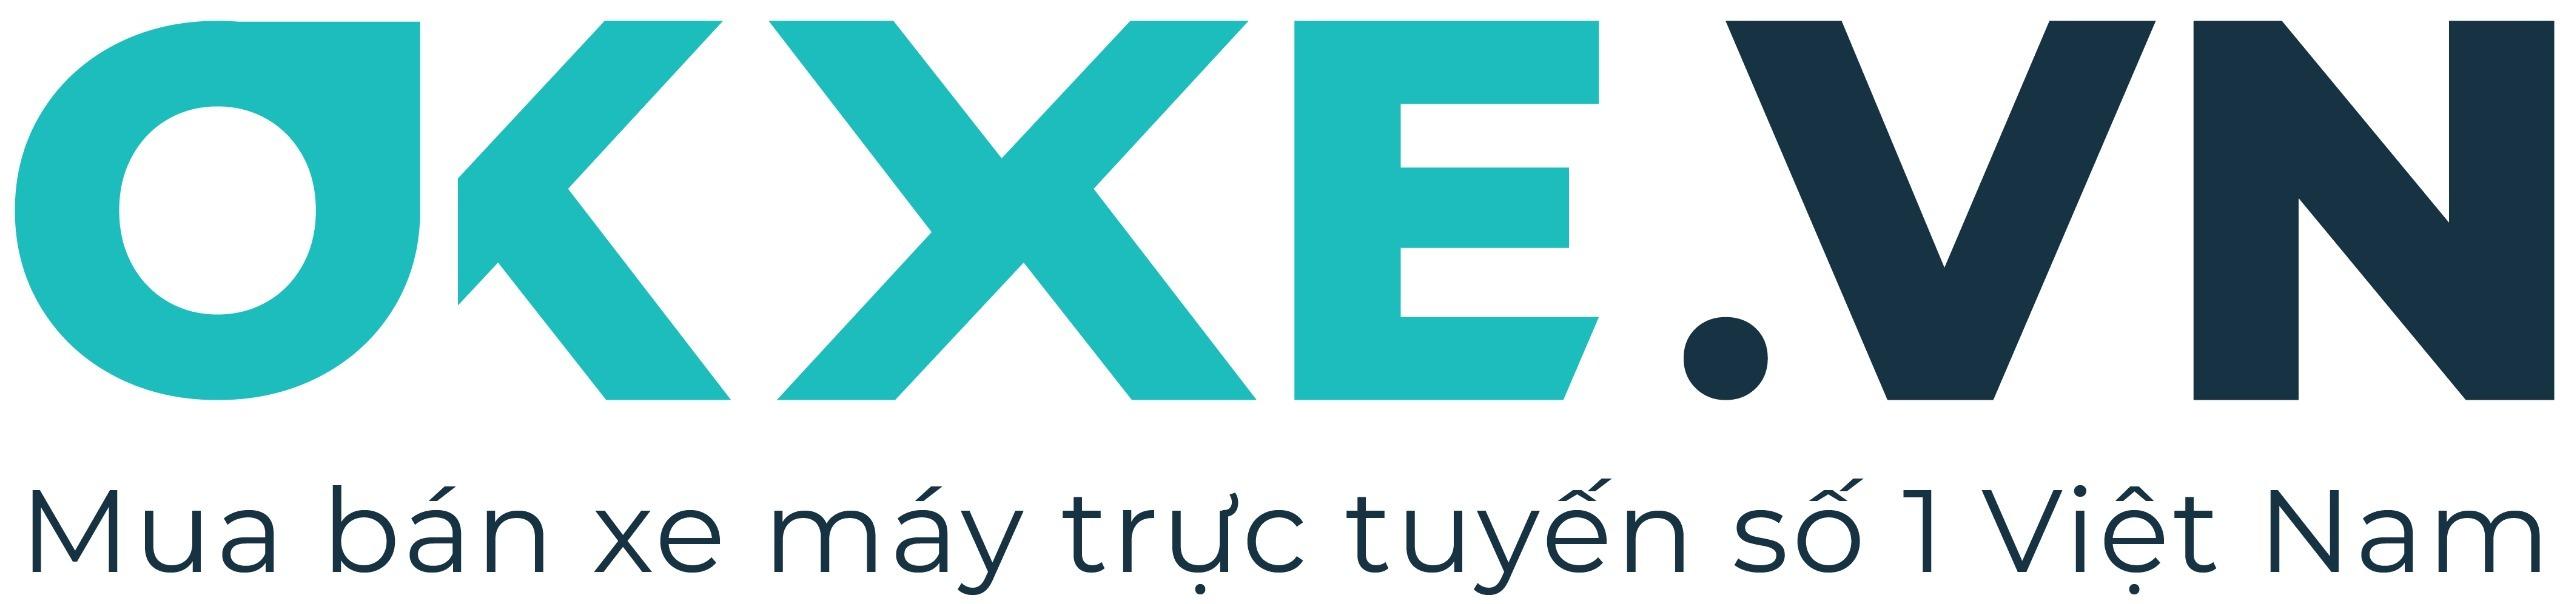 OKXE VN (@okxe) Cover Image